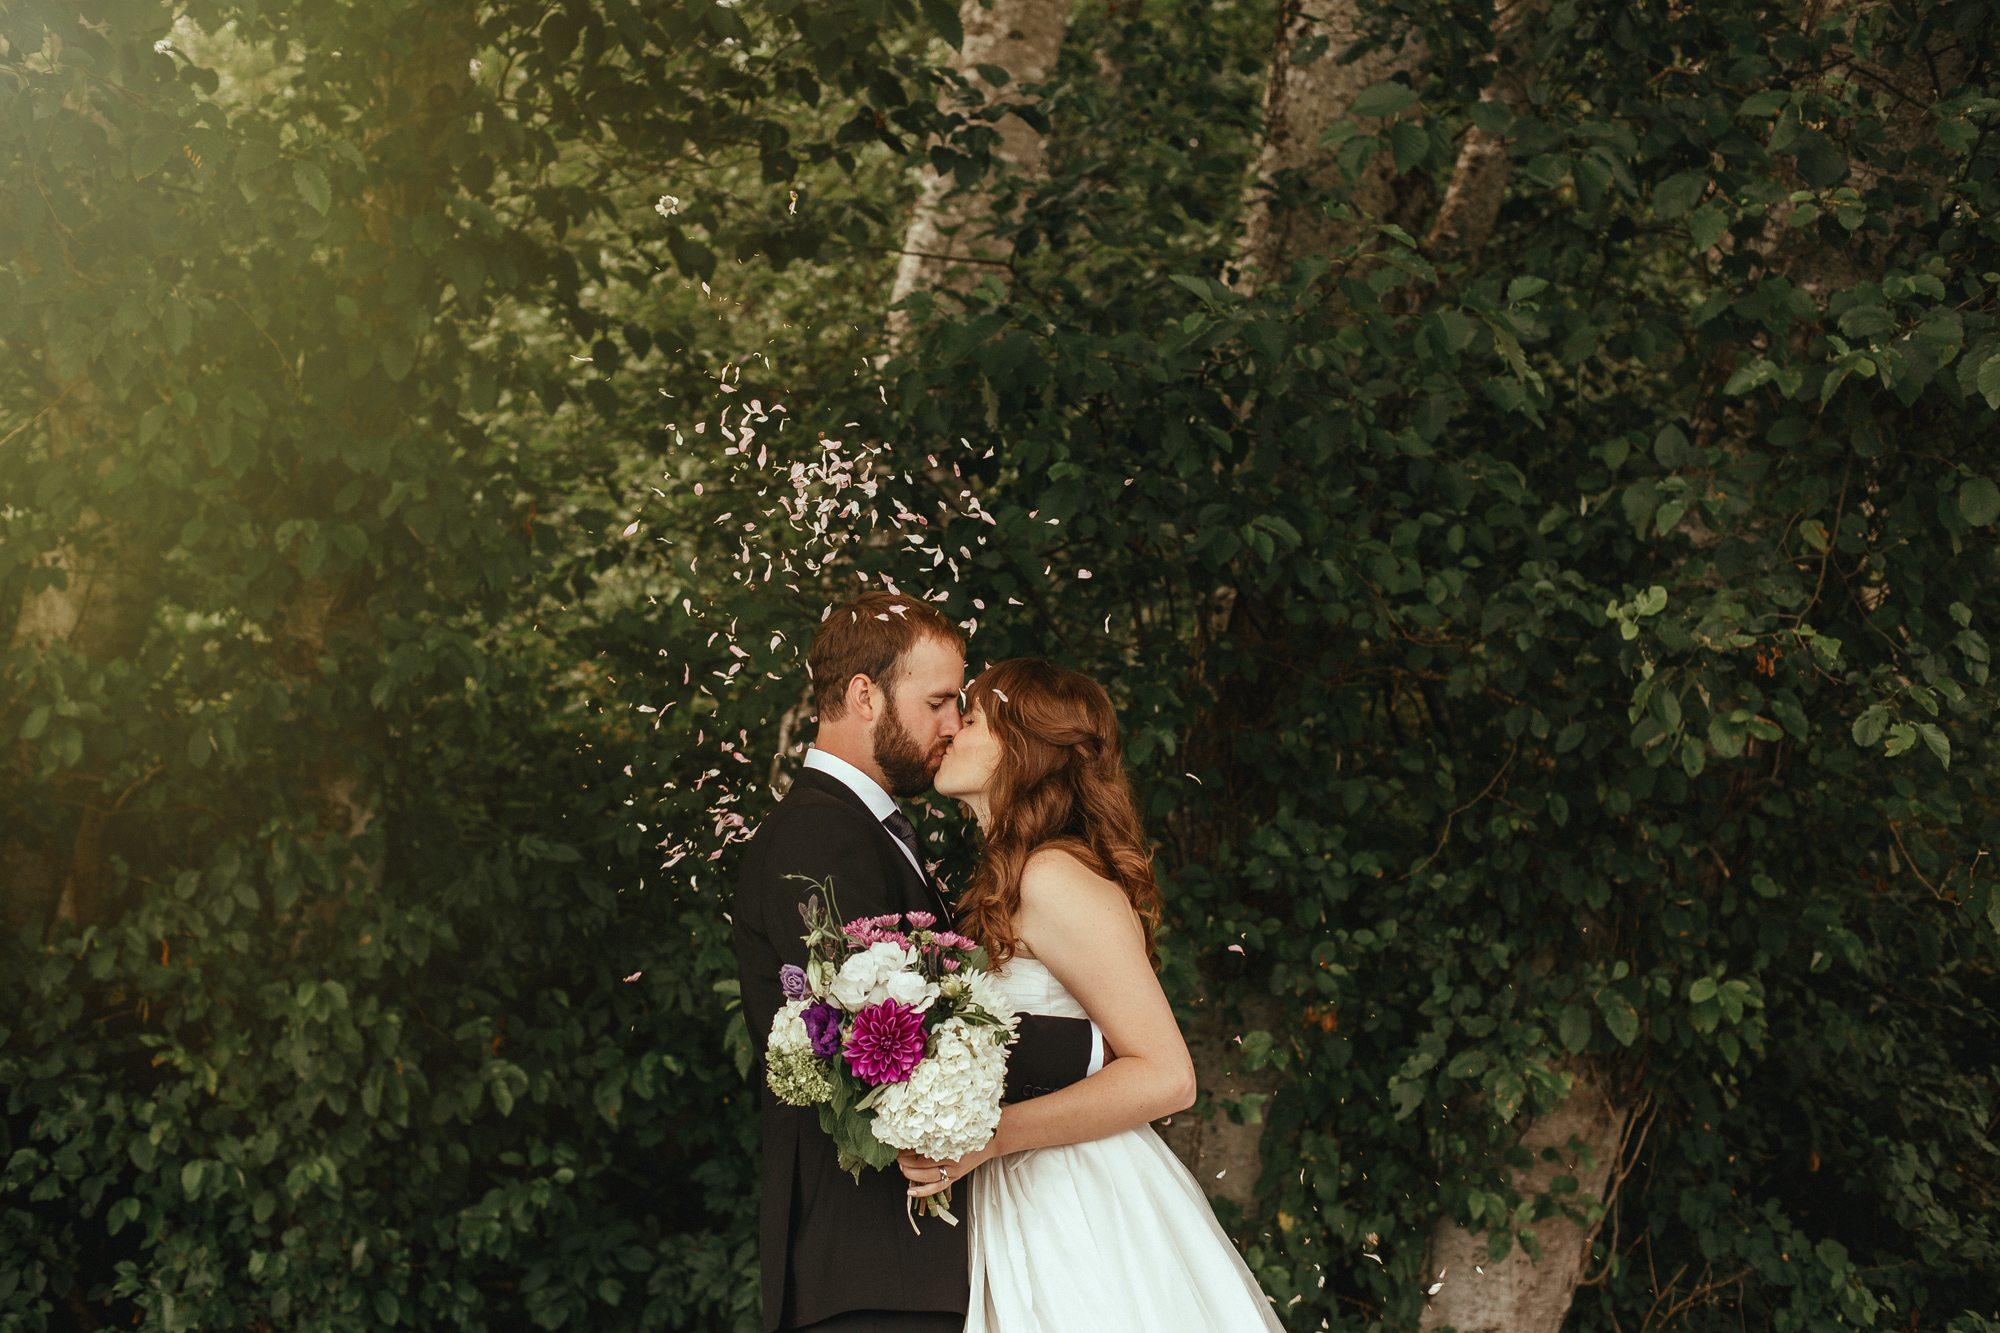 gibsons-wedding-photography-robert-devon32